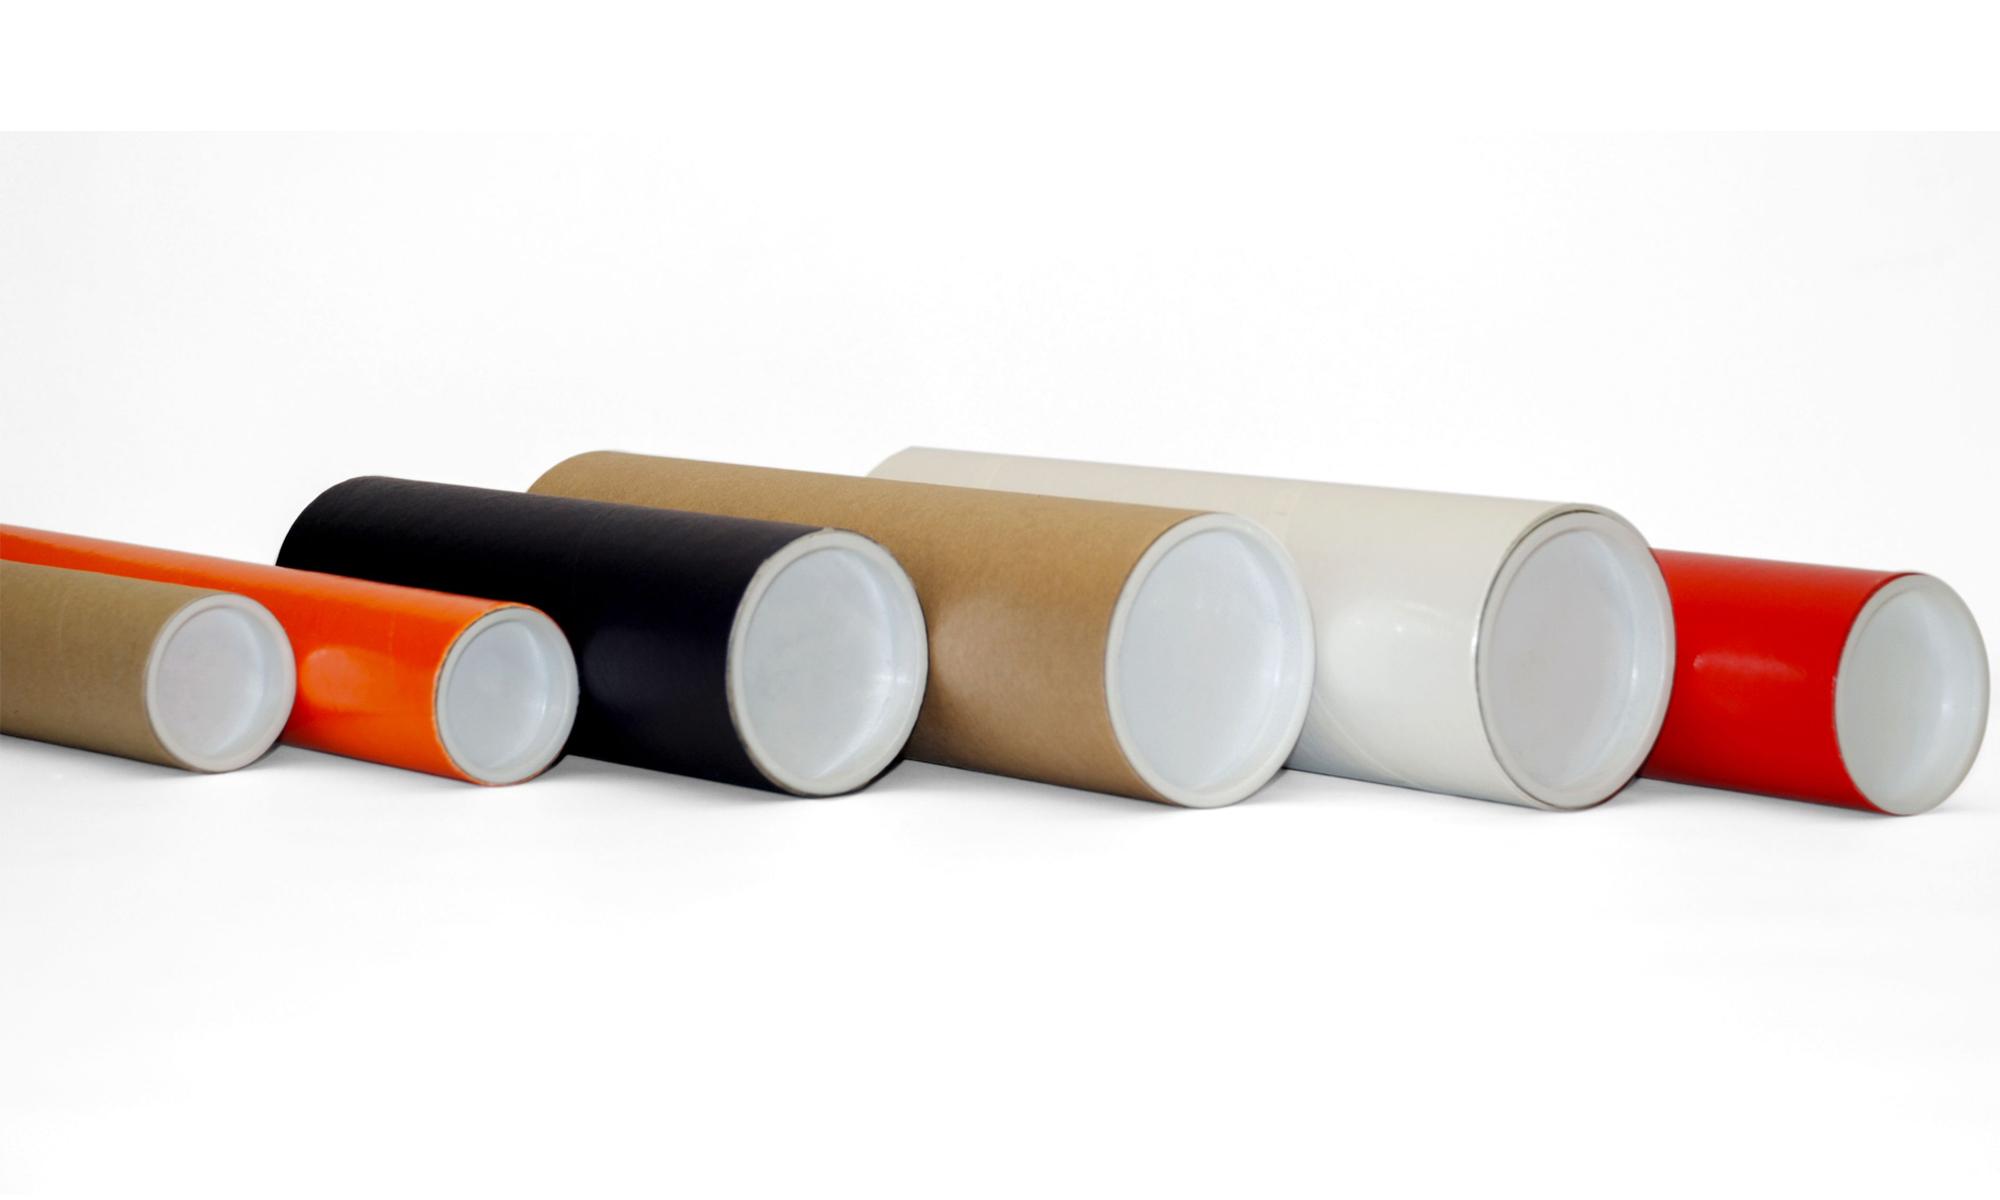 multicolored tubes